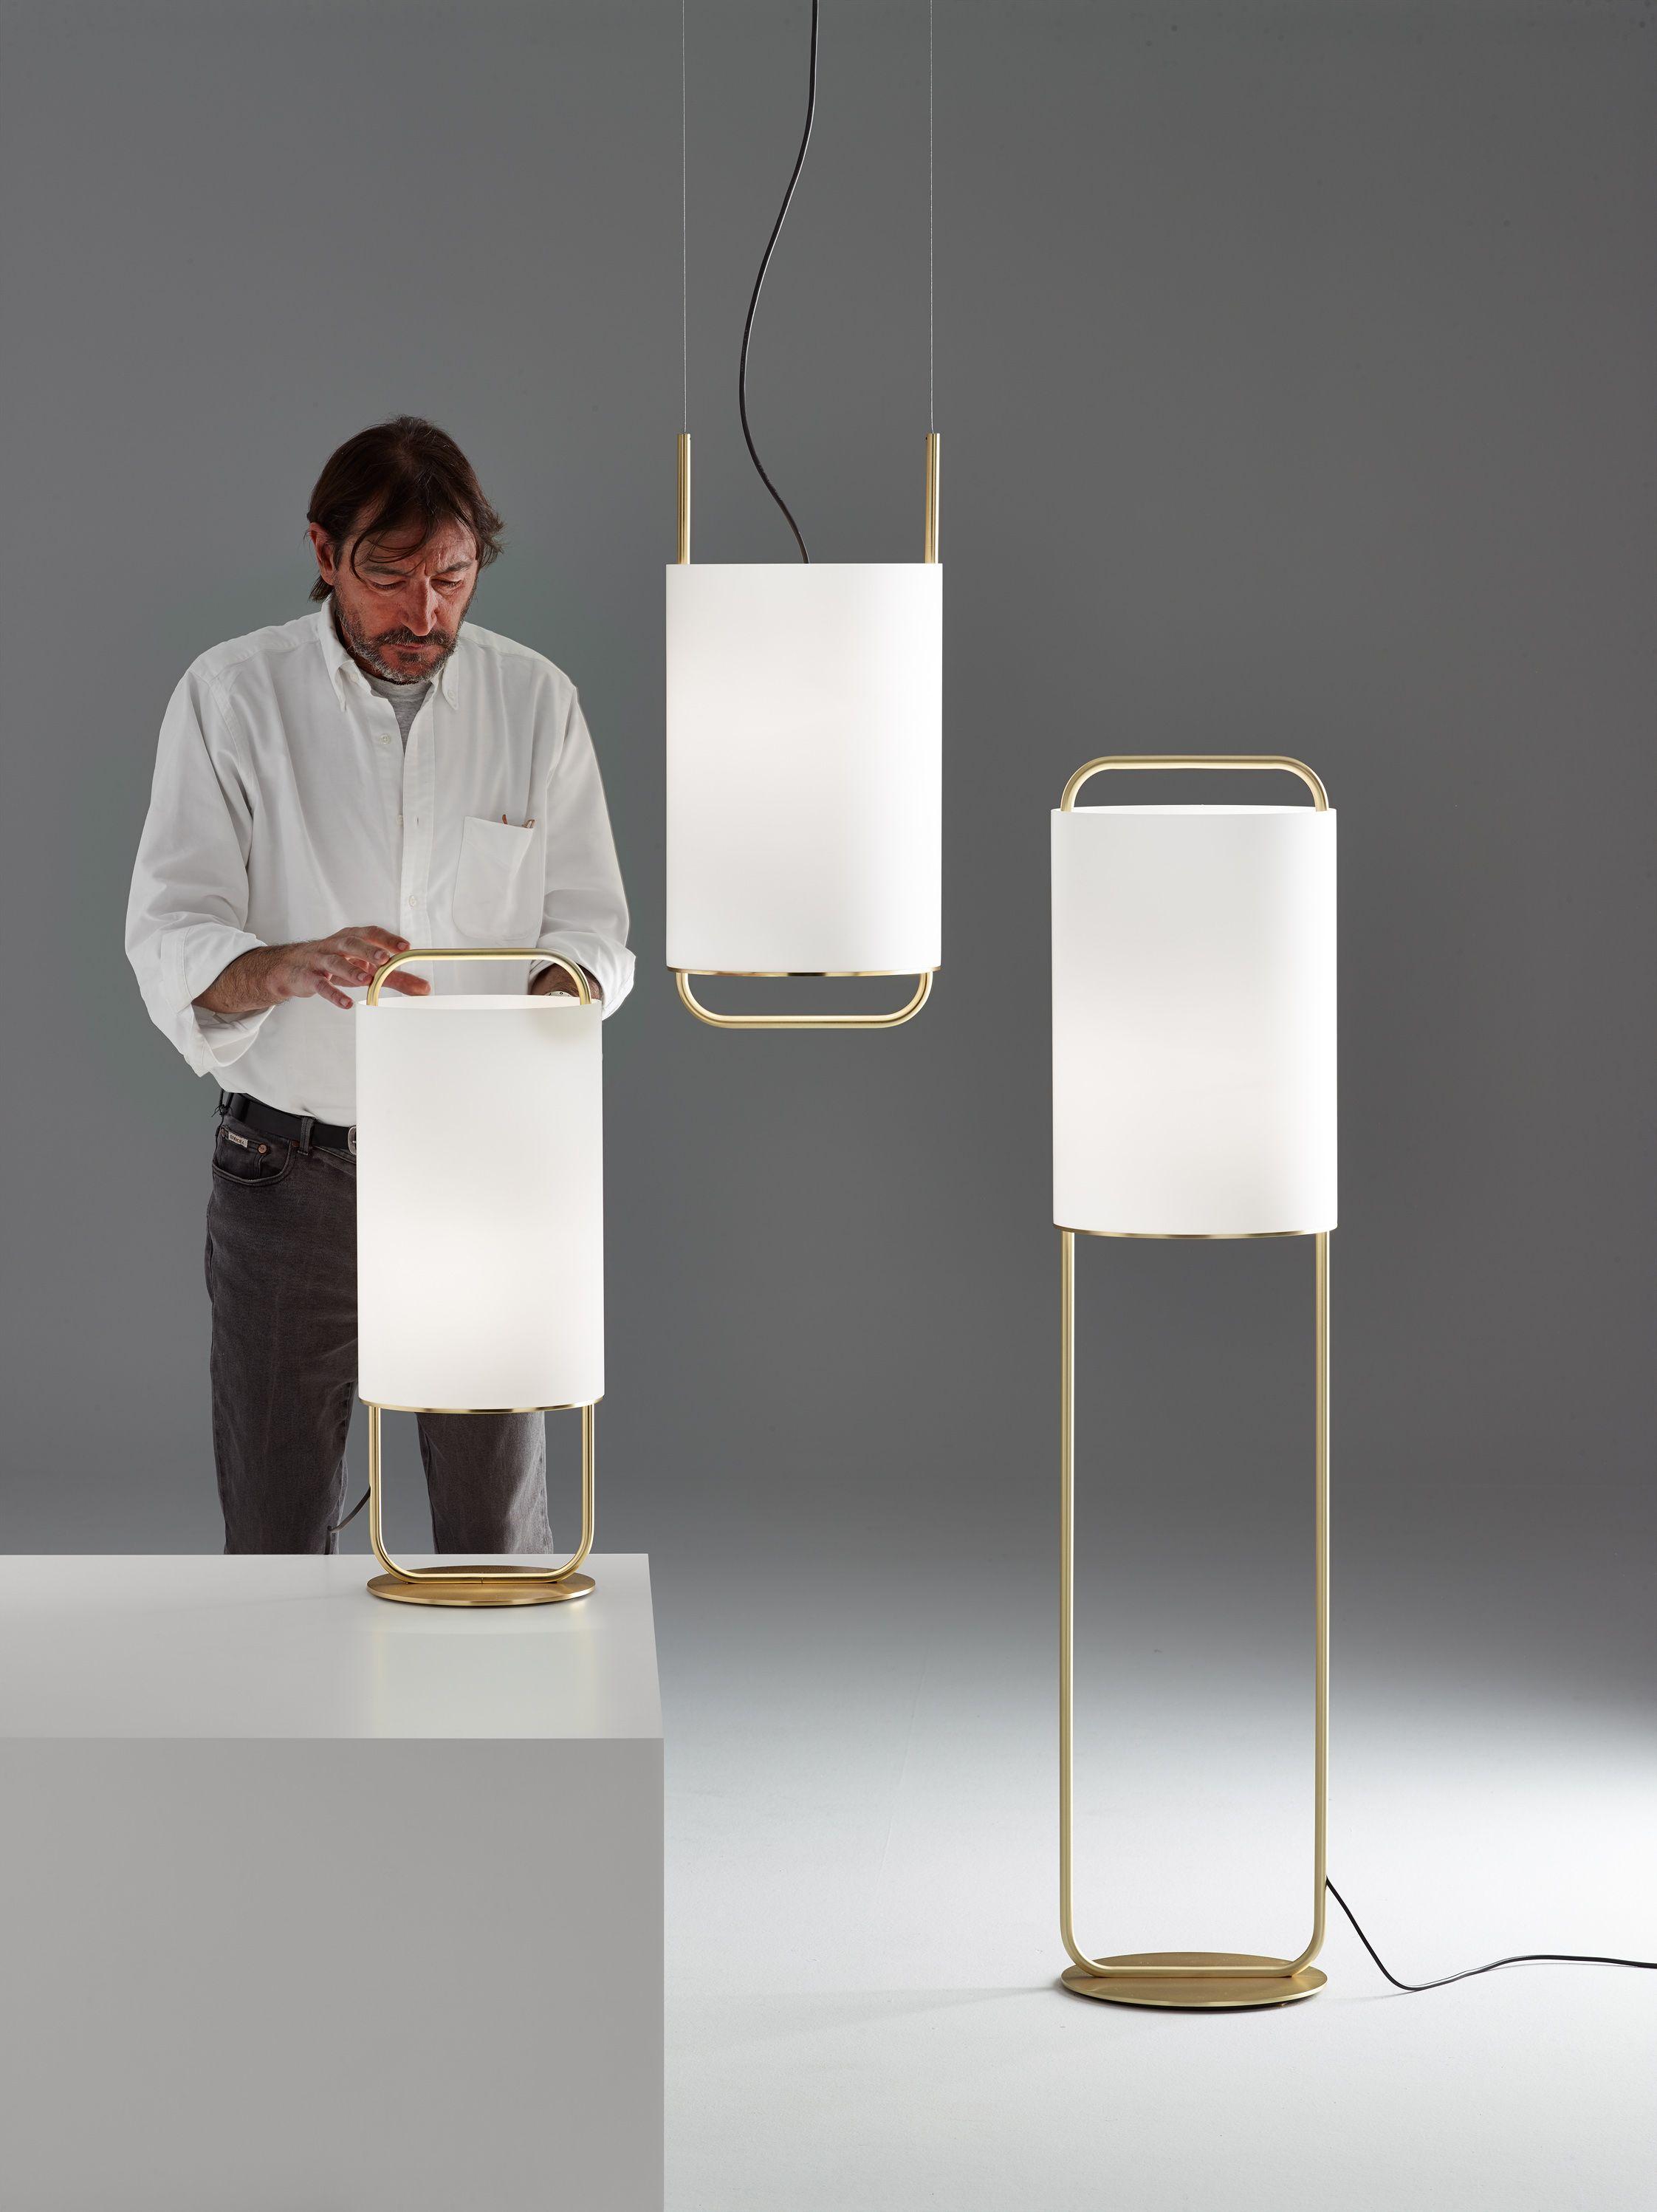 Alistair P In 2020 Floor Lamp Room